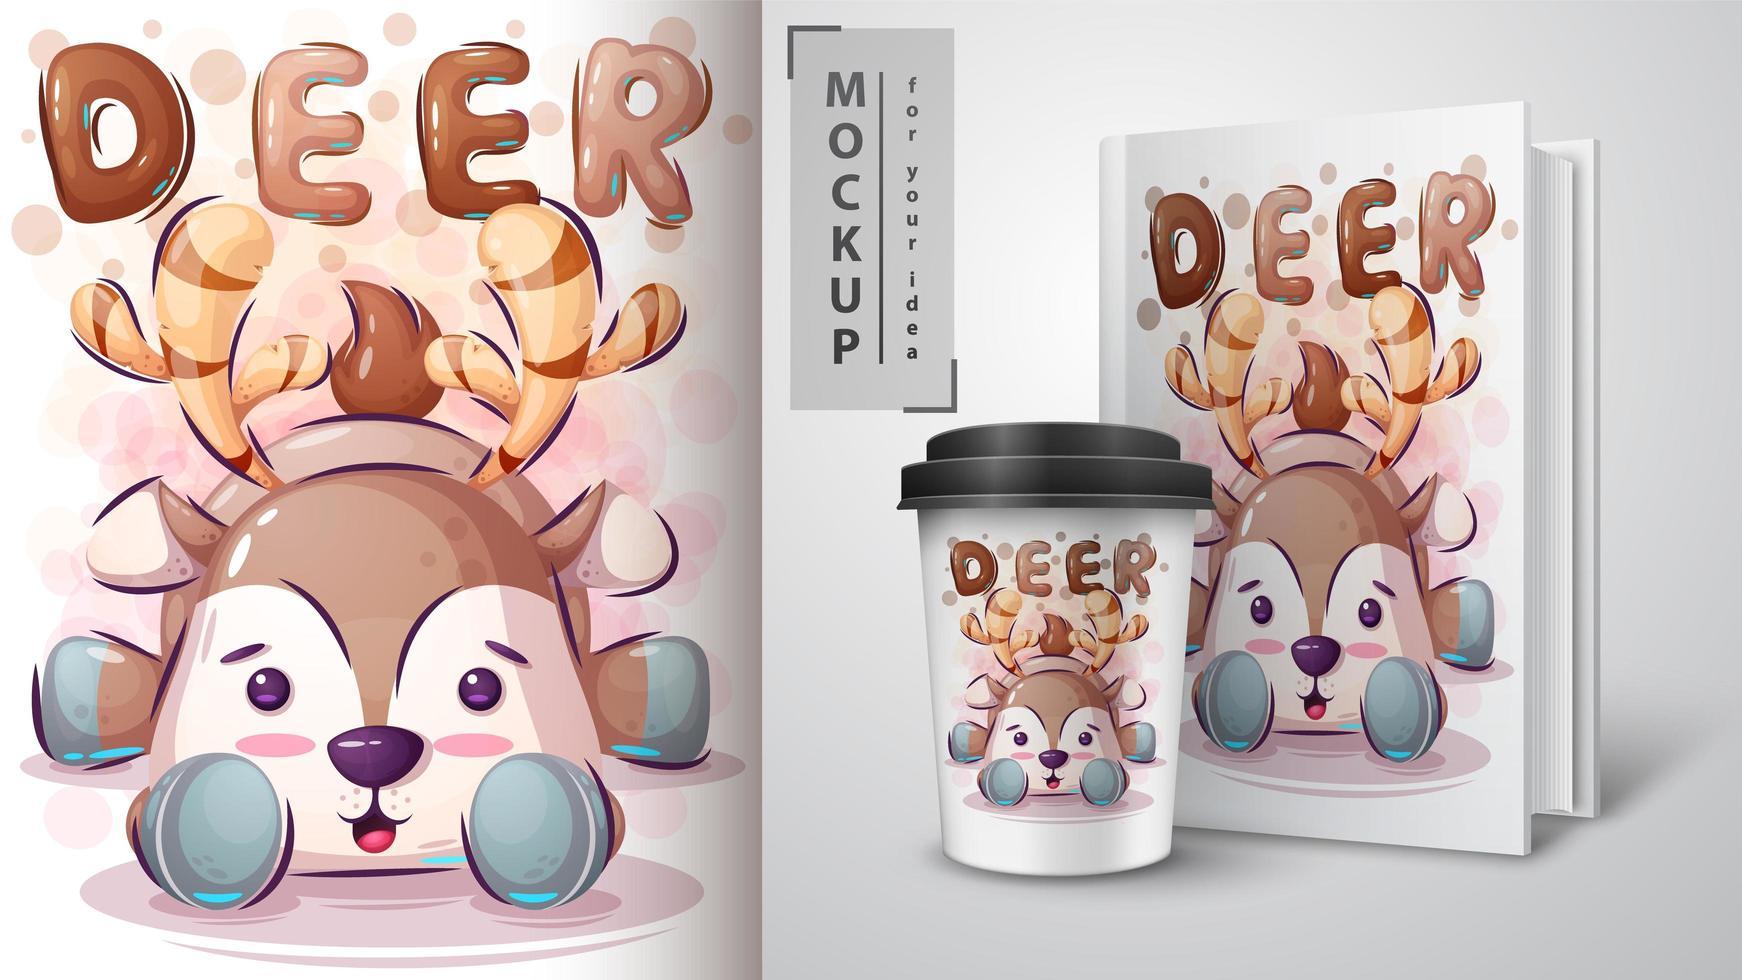 teddy caro poster e merchandising vettore